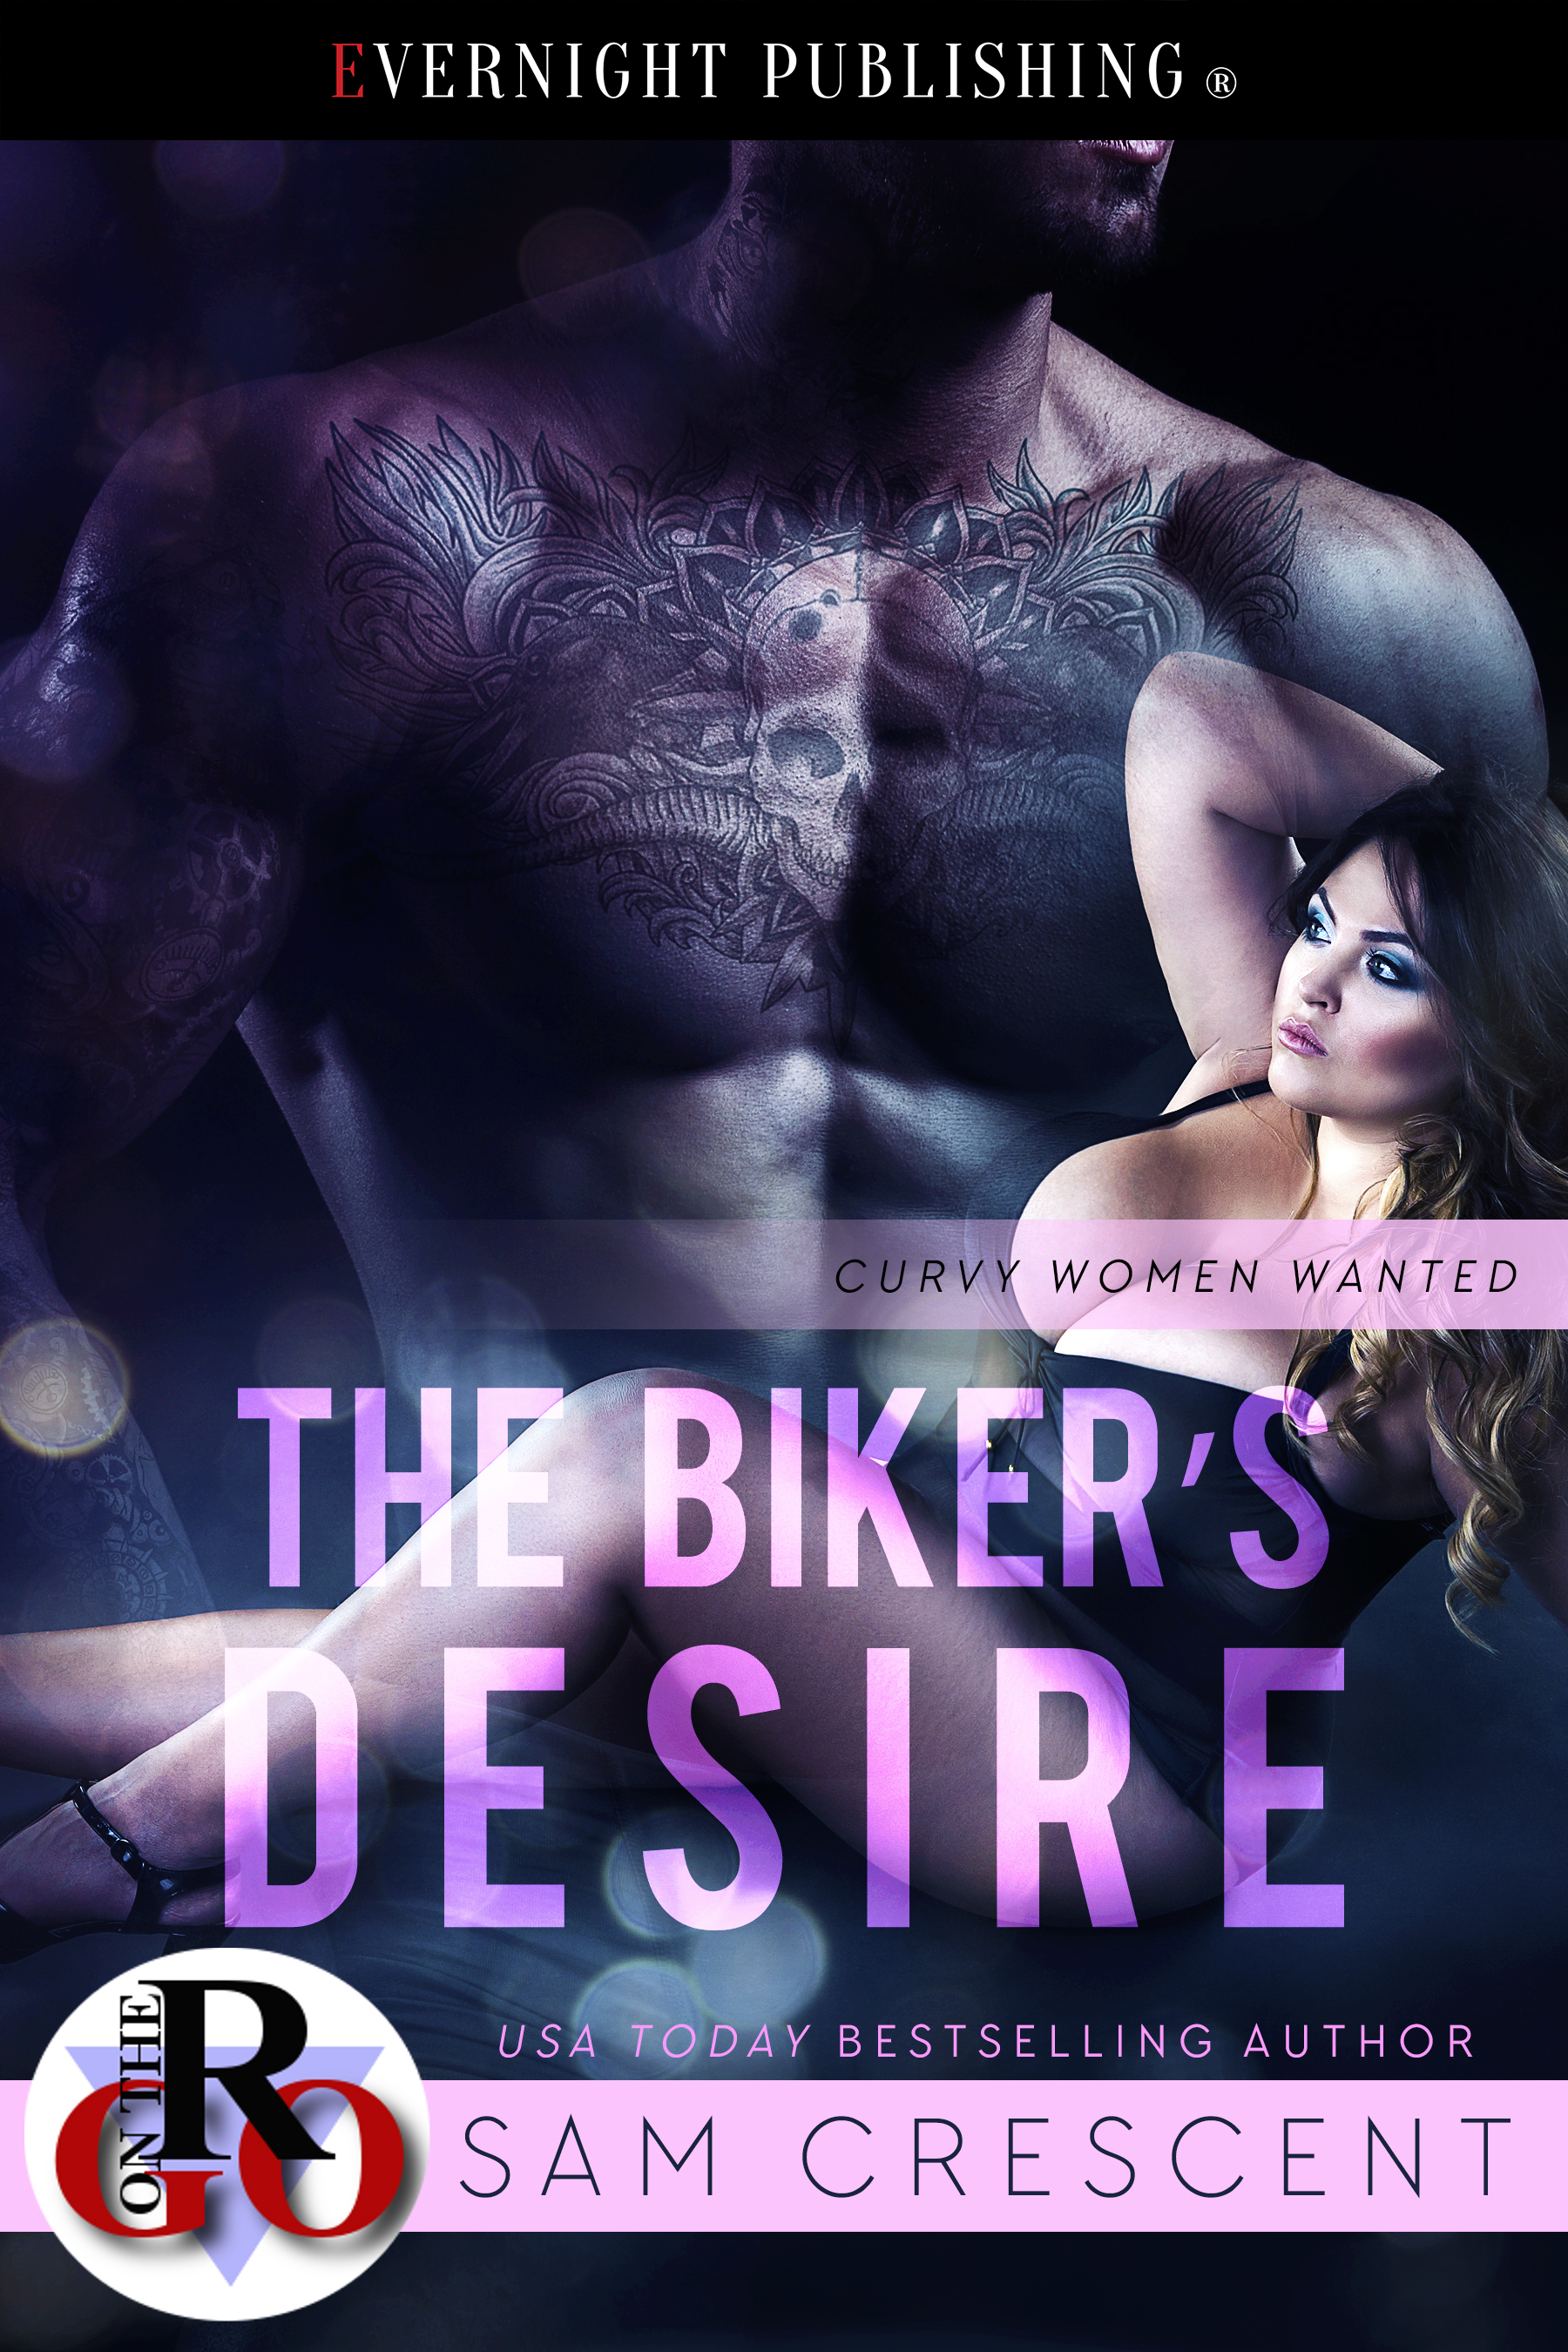 the-bikers-desire-evernightpublishing-AUG2017-A